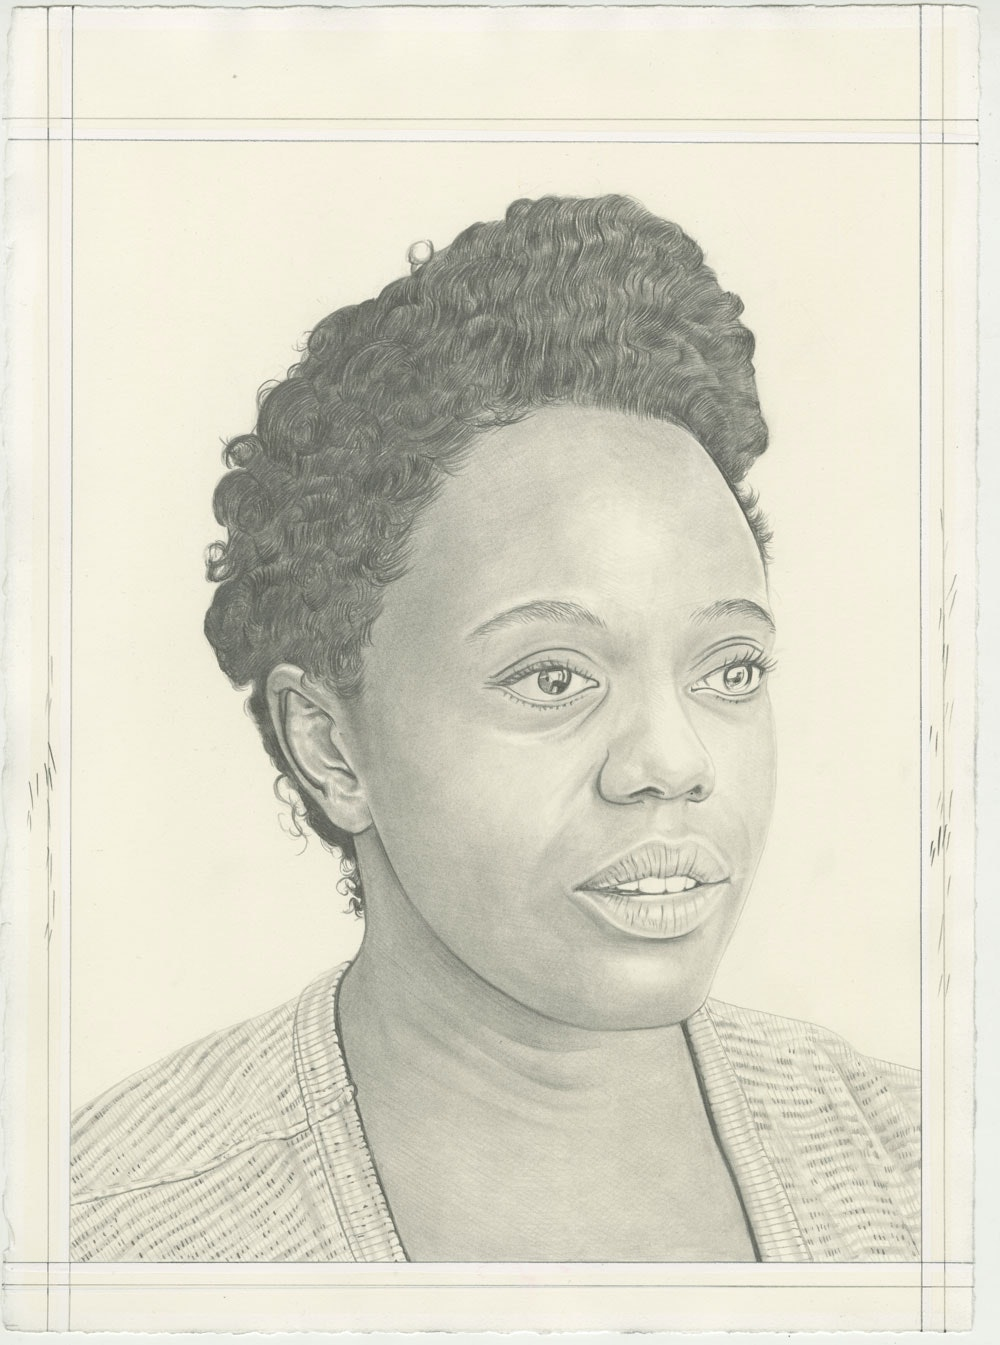 Portrait of Leslie Hewitt, pencil on paper by Phong H. Bui.